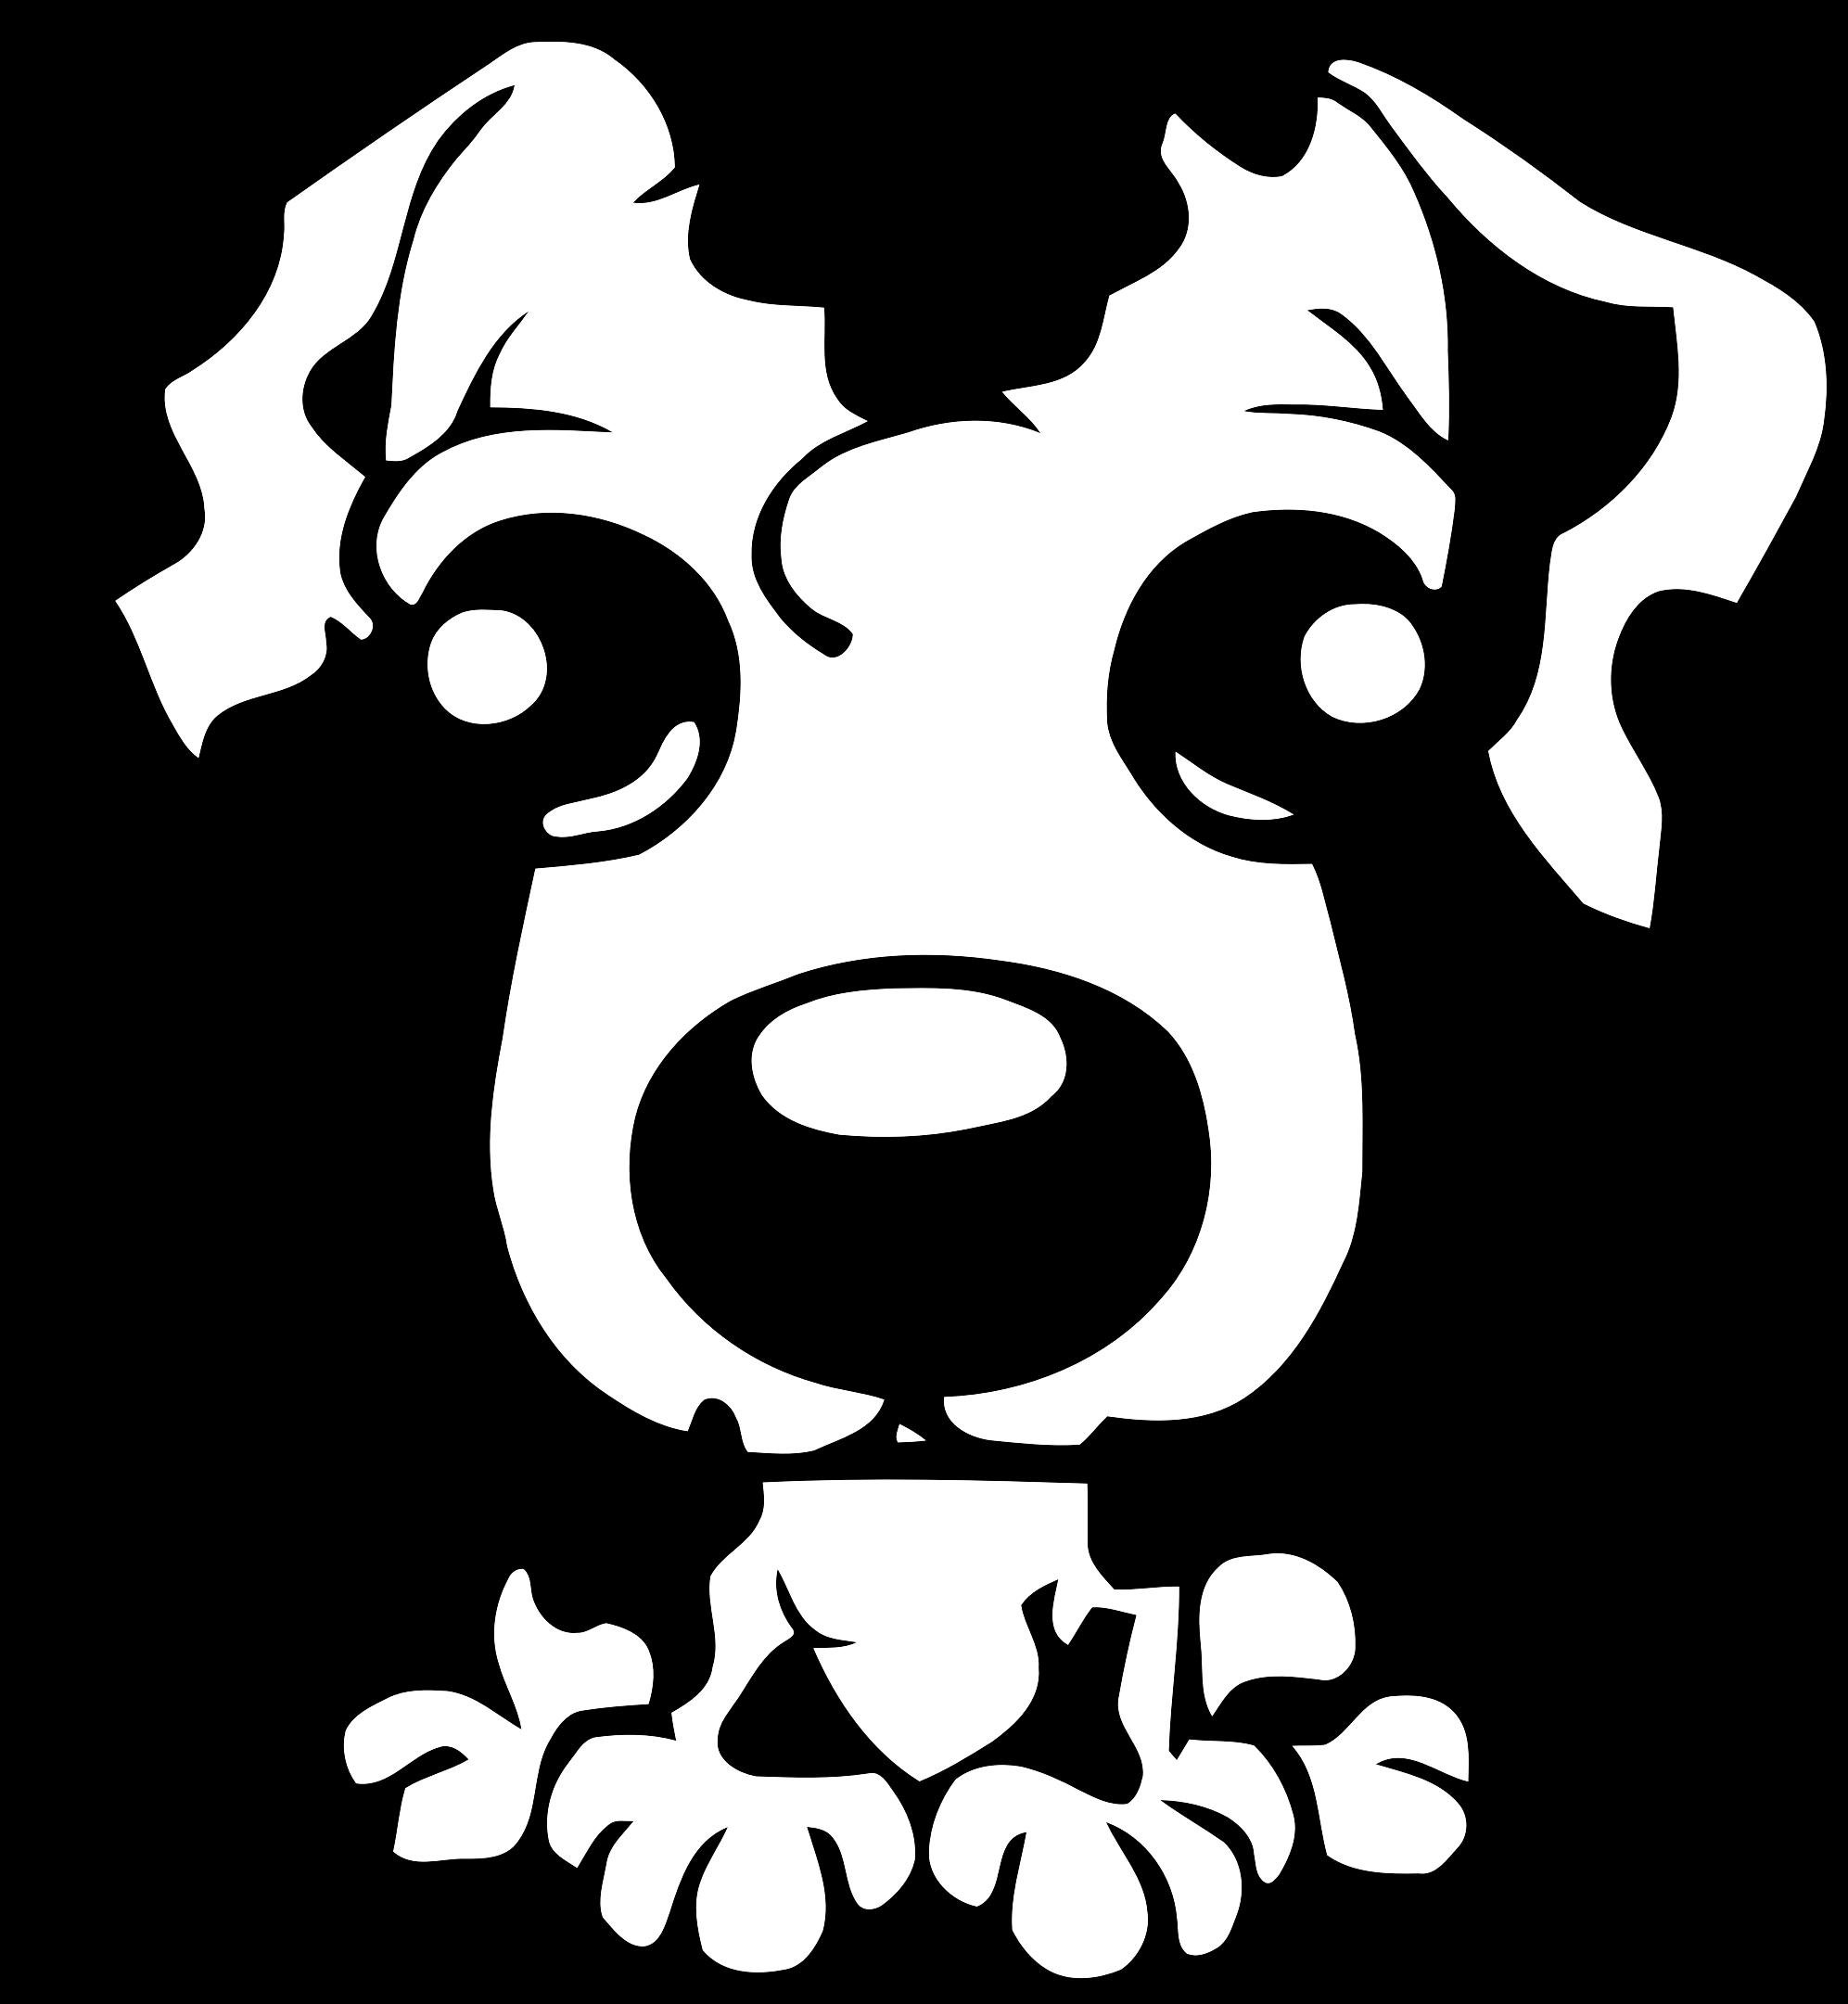 Puppy dog clipart black and white jpg black and white Clipart - Puppy Icon jpg black and white